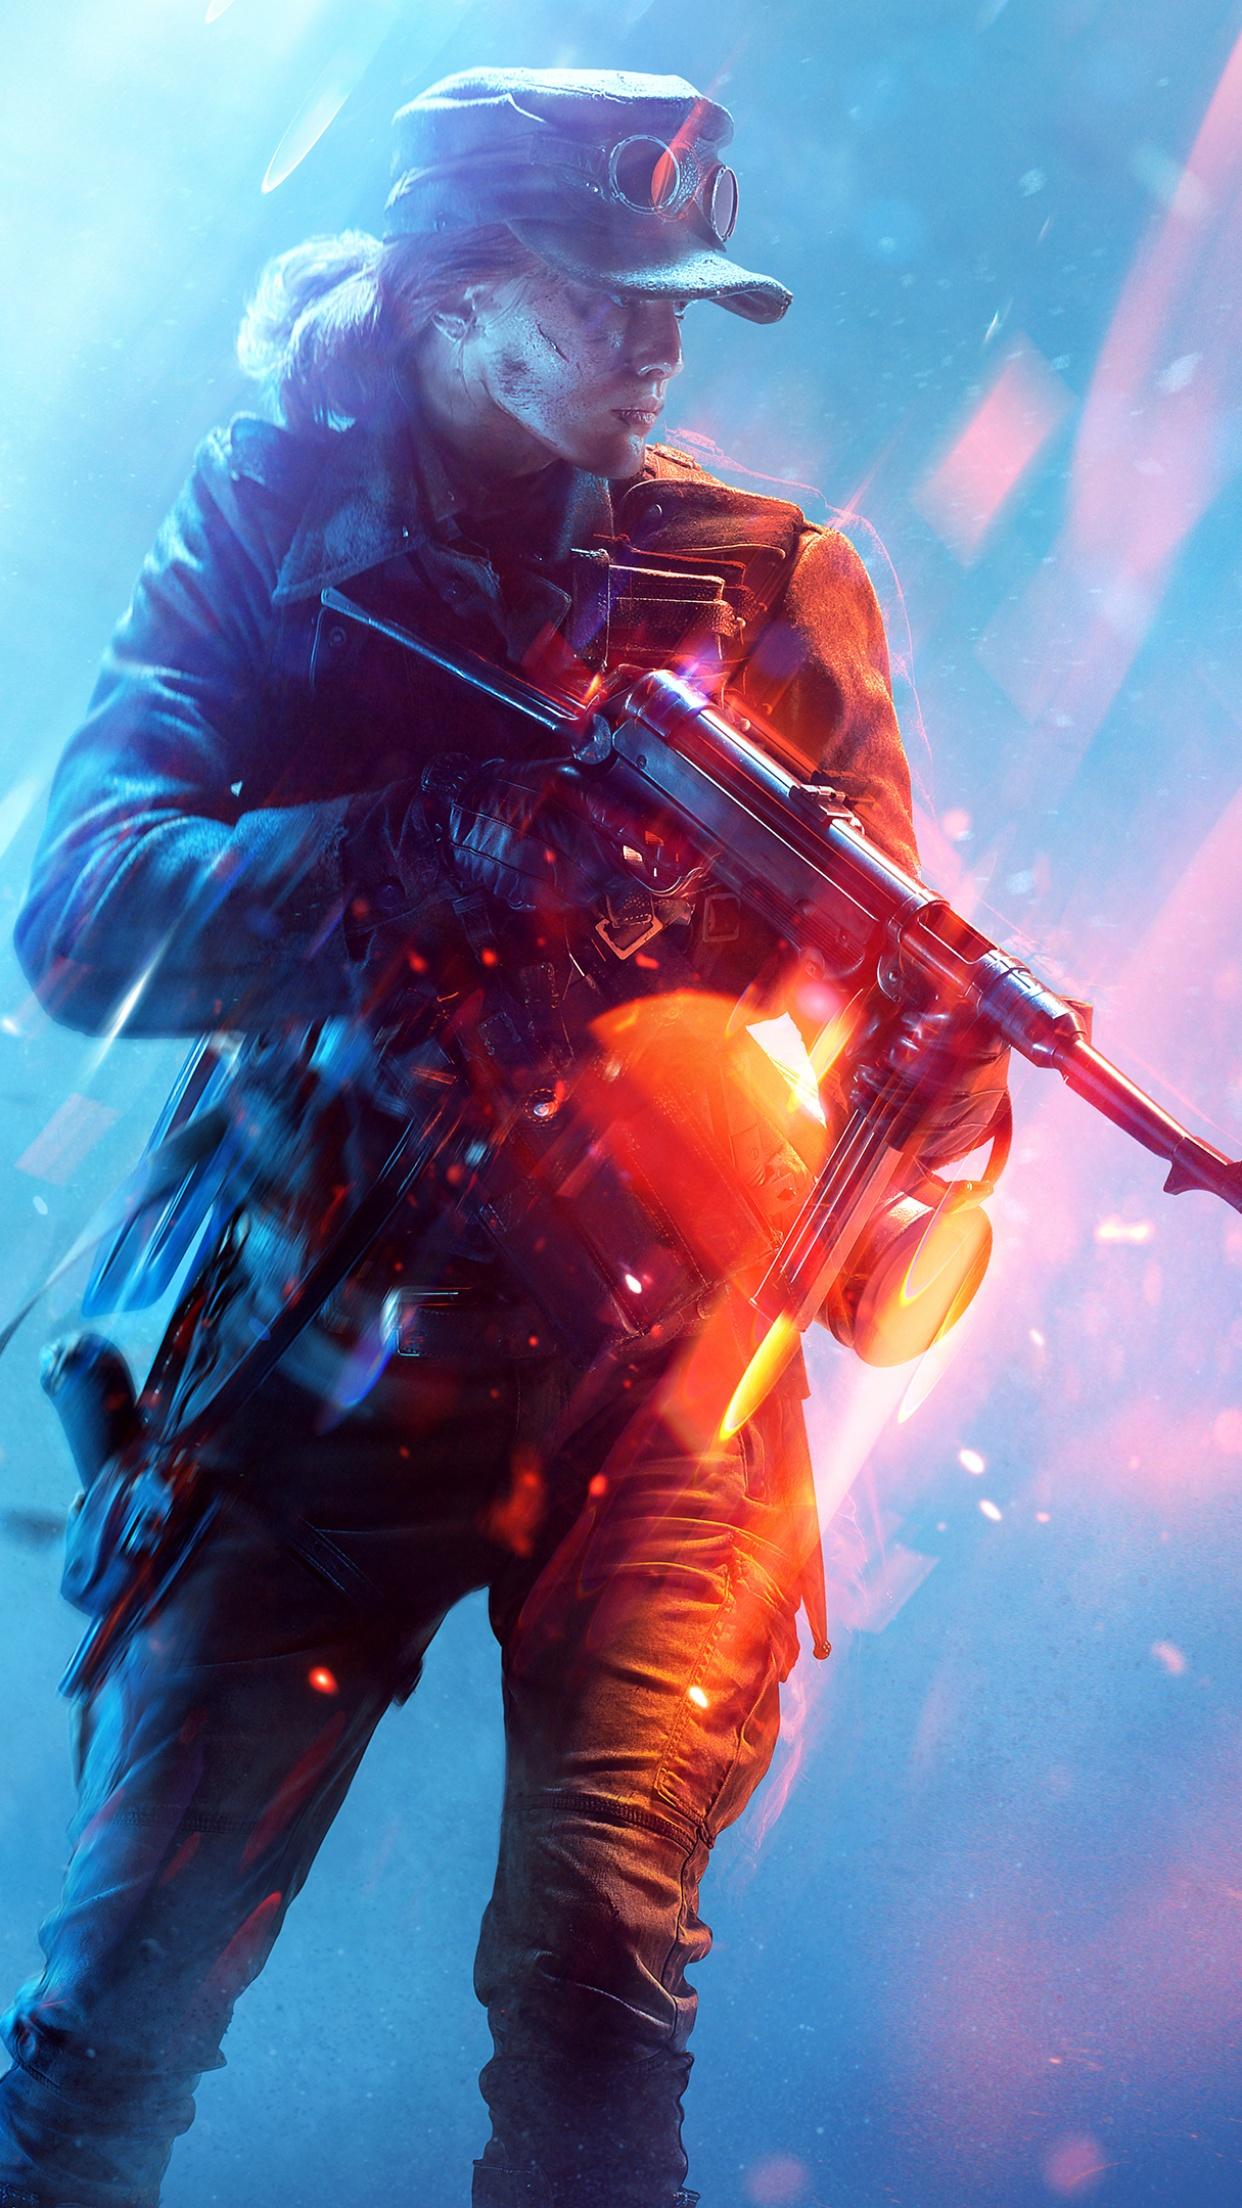 Battlefield V Wallpaper 21K, PlayStation 21, Xbox One, PC Games ...